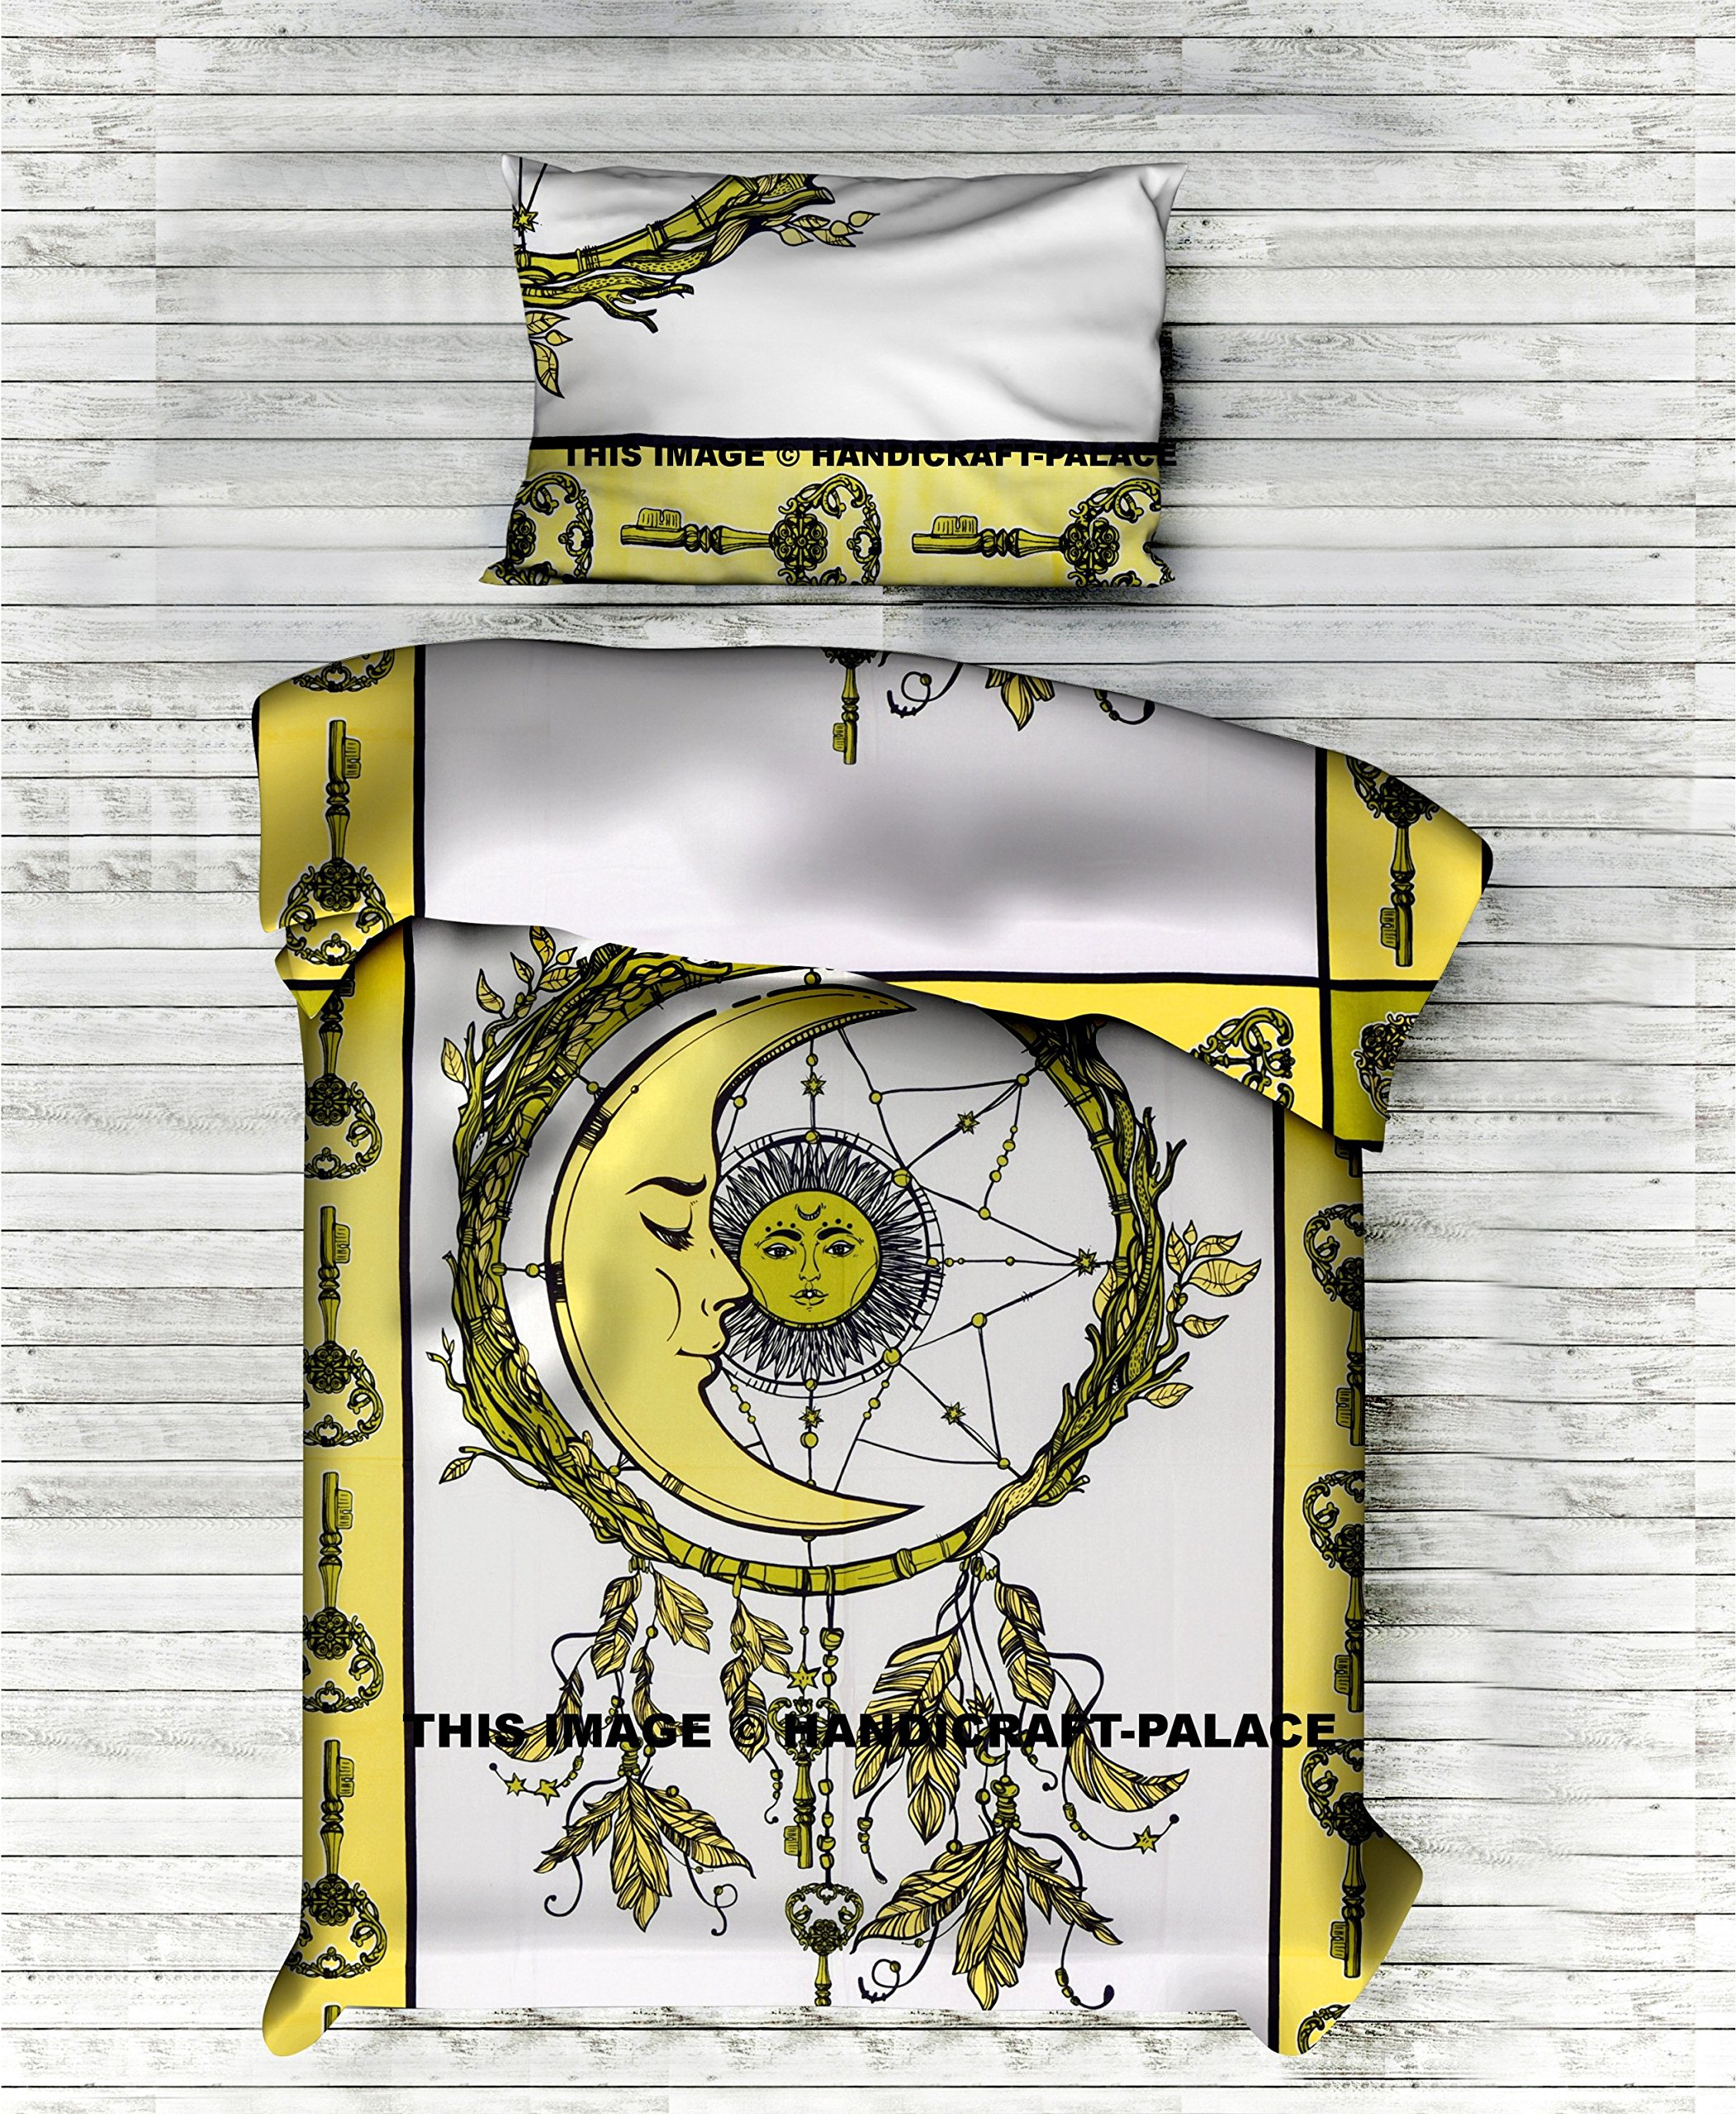 Handicraft-Palace Indian Medallion Twin Size Cotton Doona Duvet Cover Set Hippie Bohemian Mandala Blanket Quilt Cover Bedspread Bedding Sun Moon Comforter Set